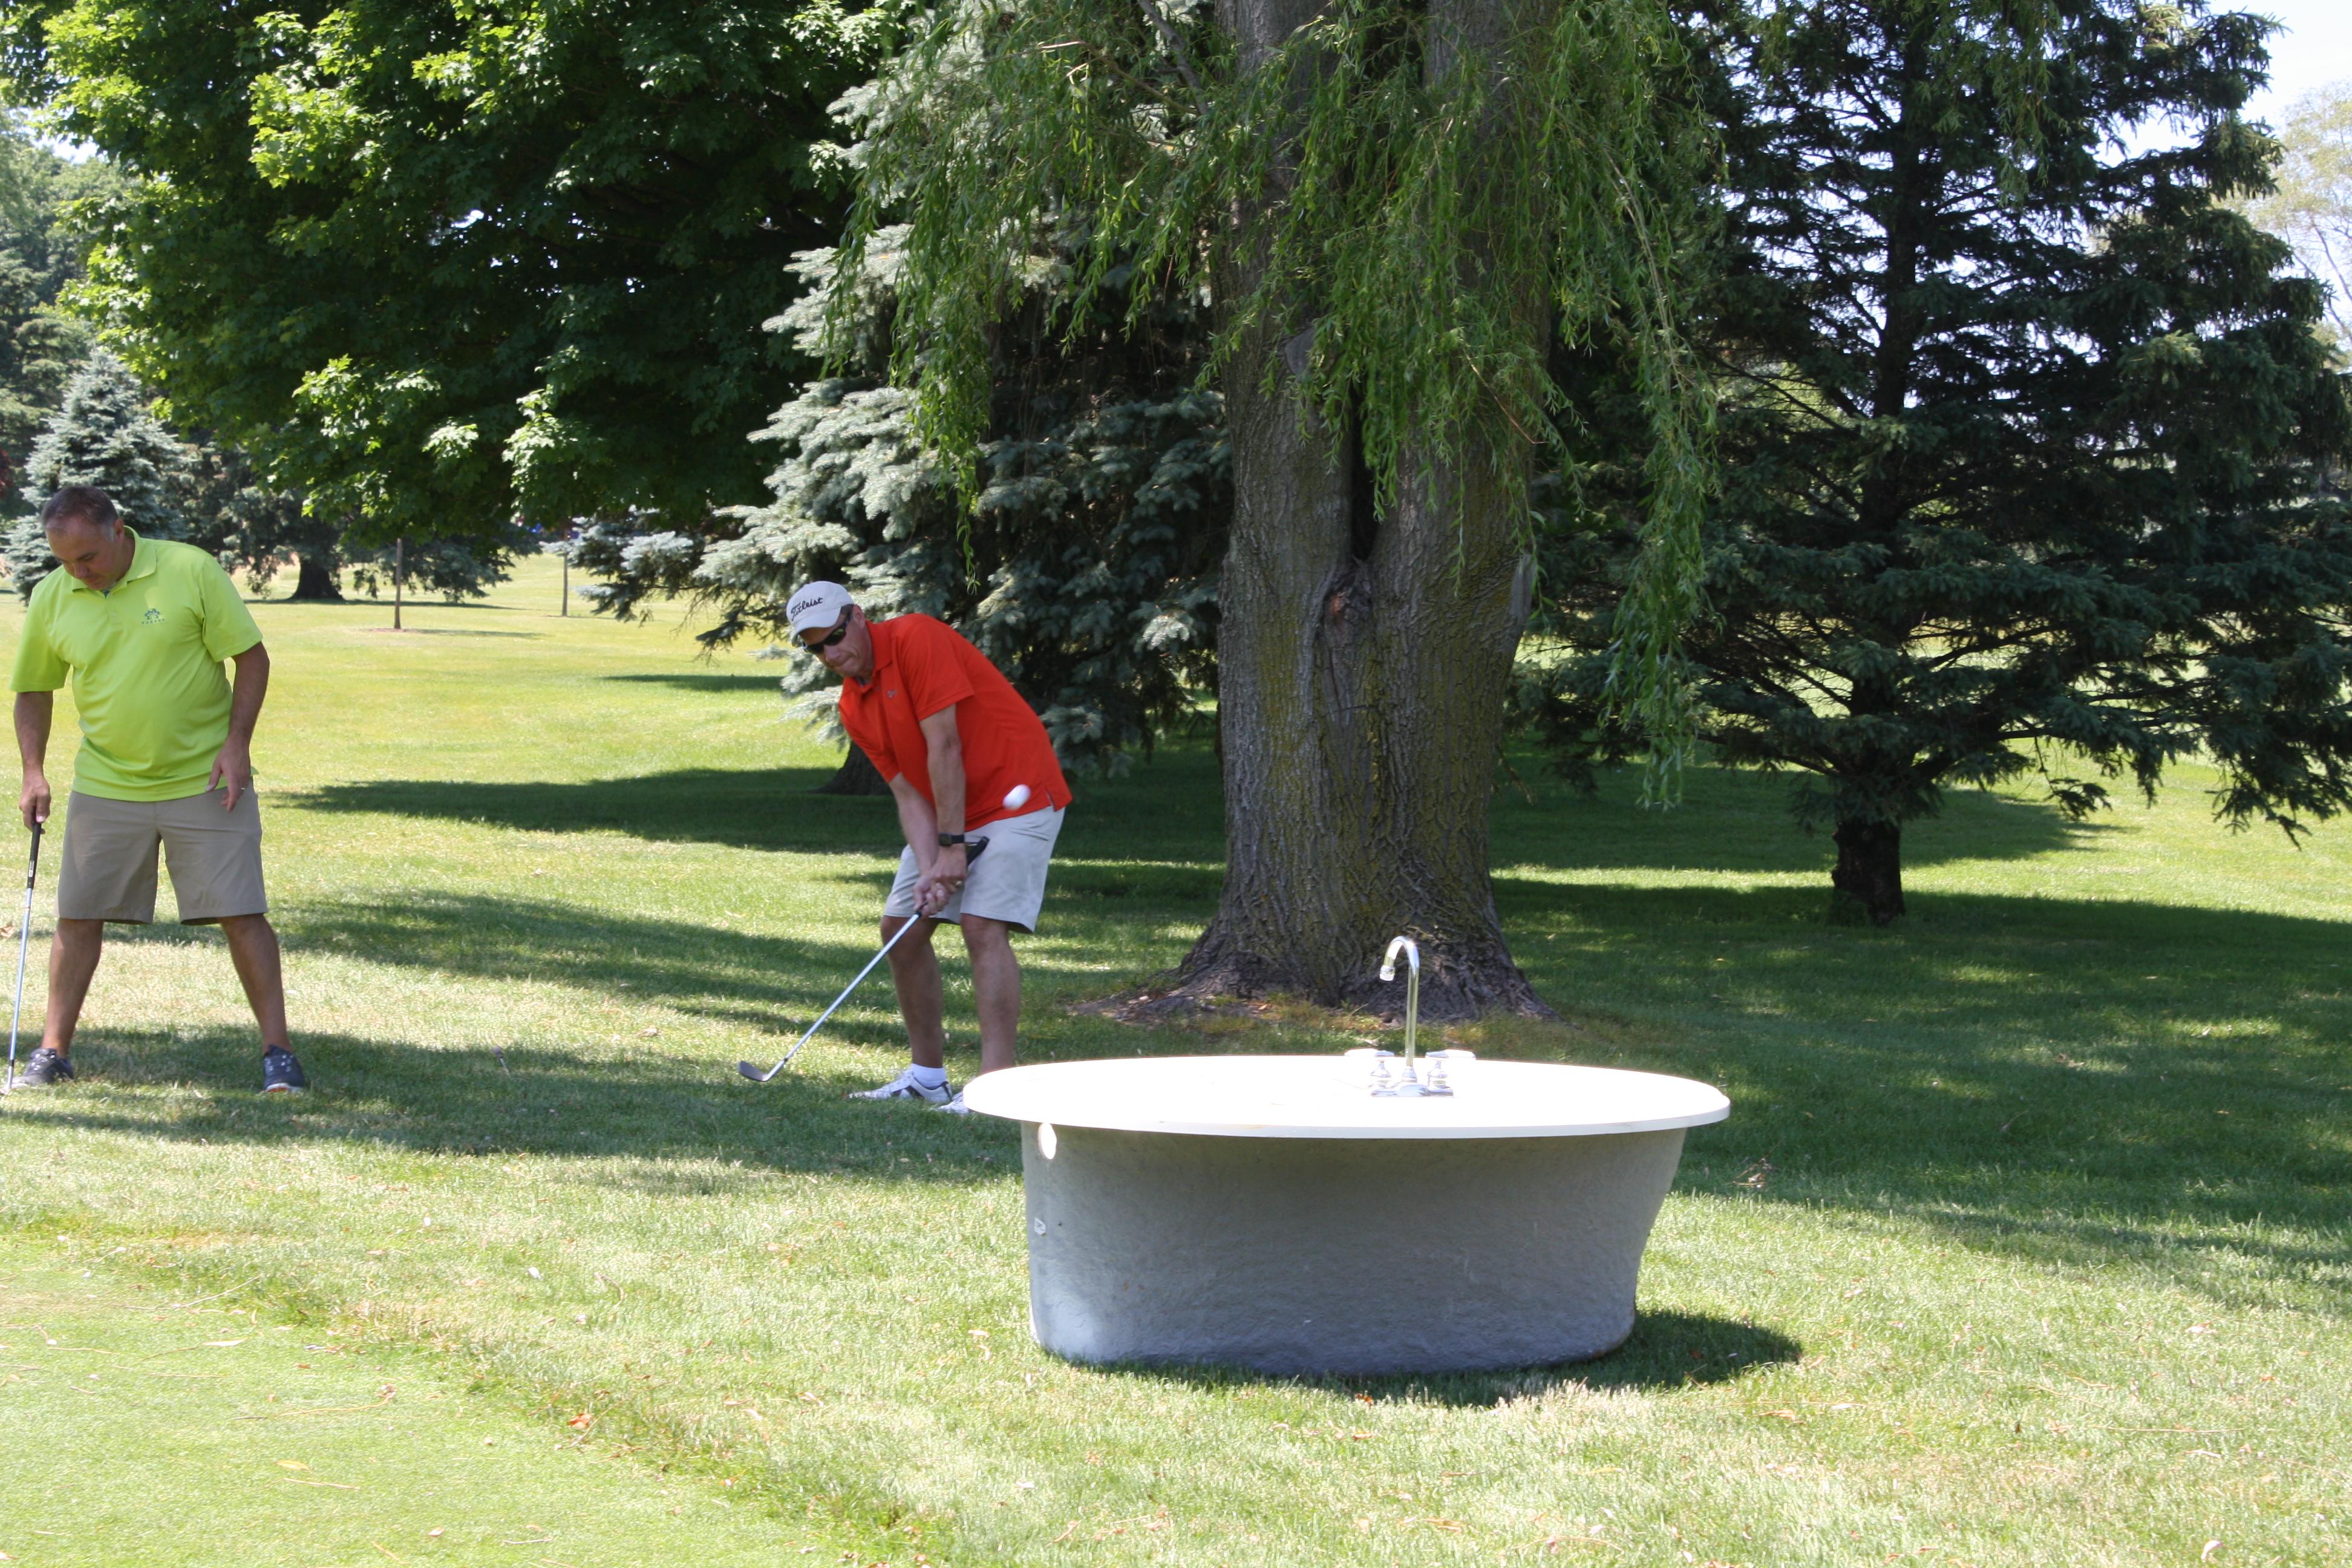 golf fore homes 2016 habitat for humanity. Black Bedroom Furniture Sets. Home Design Ideas